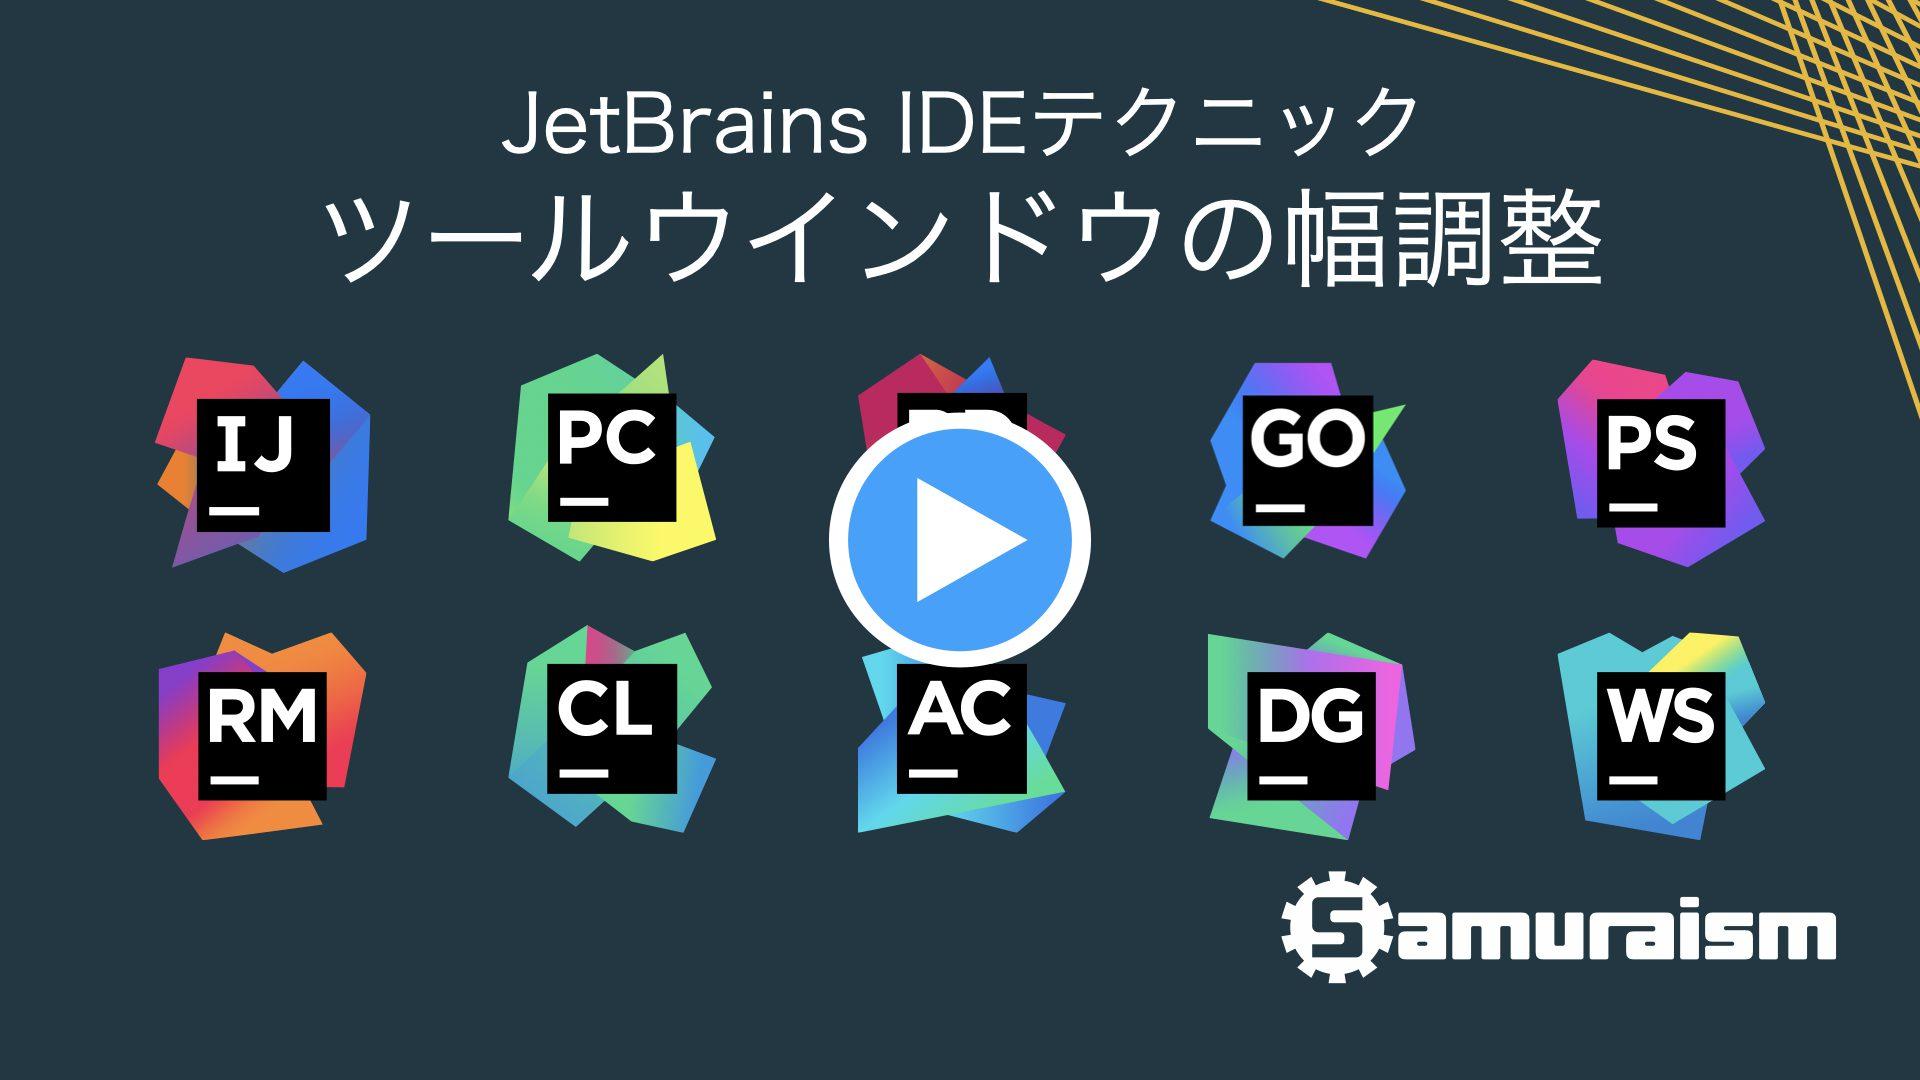 #JetBrainsIDEテクニック – ツールウインドウ幅の調整